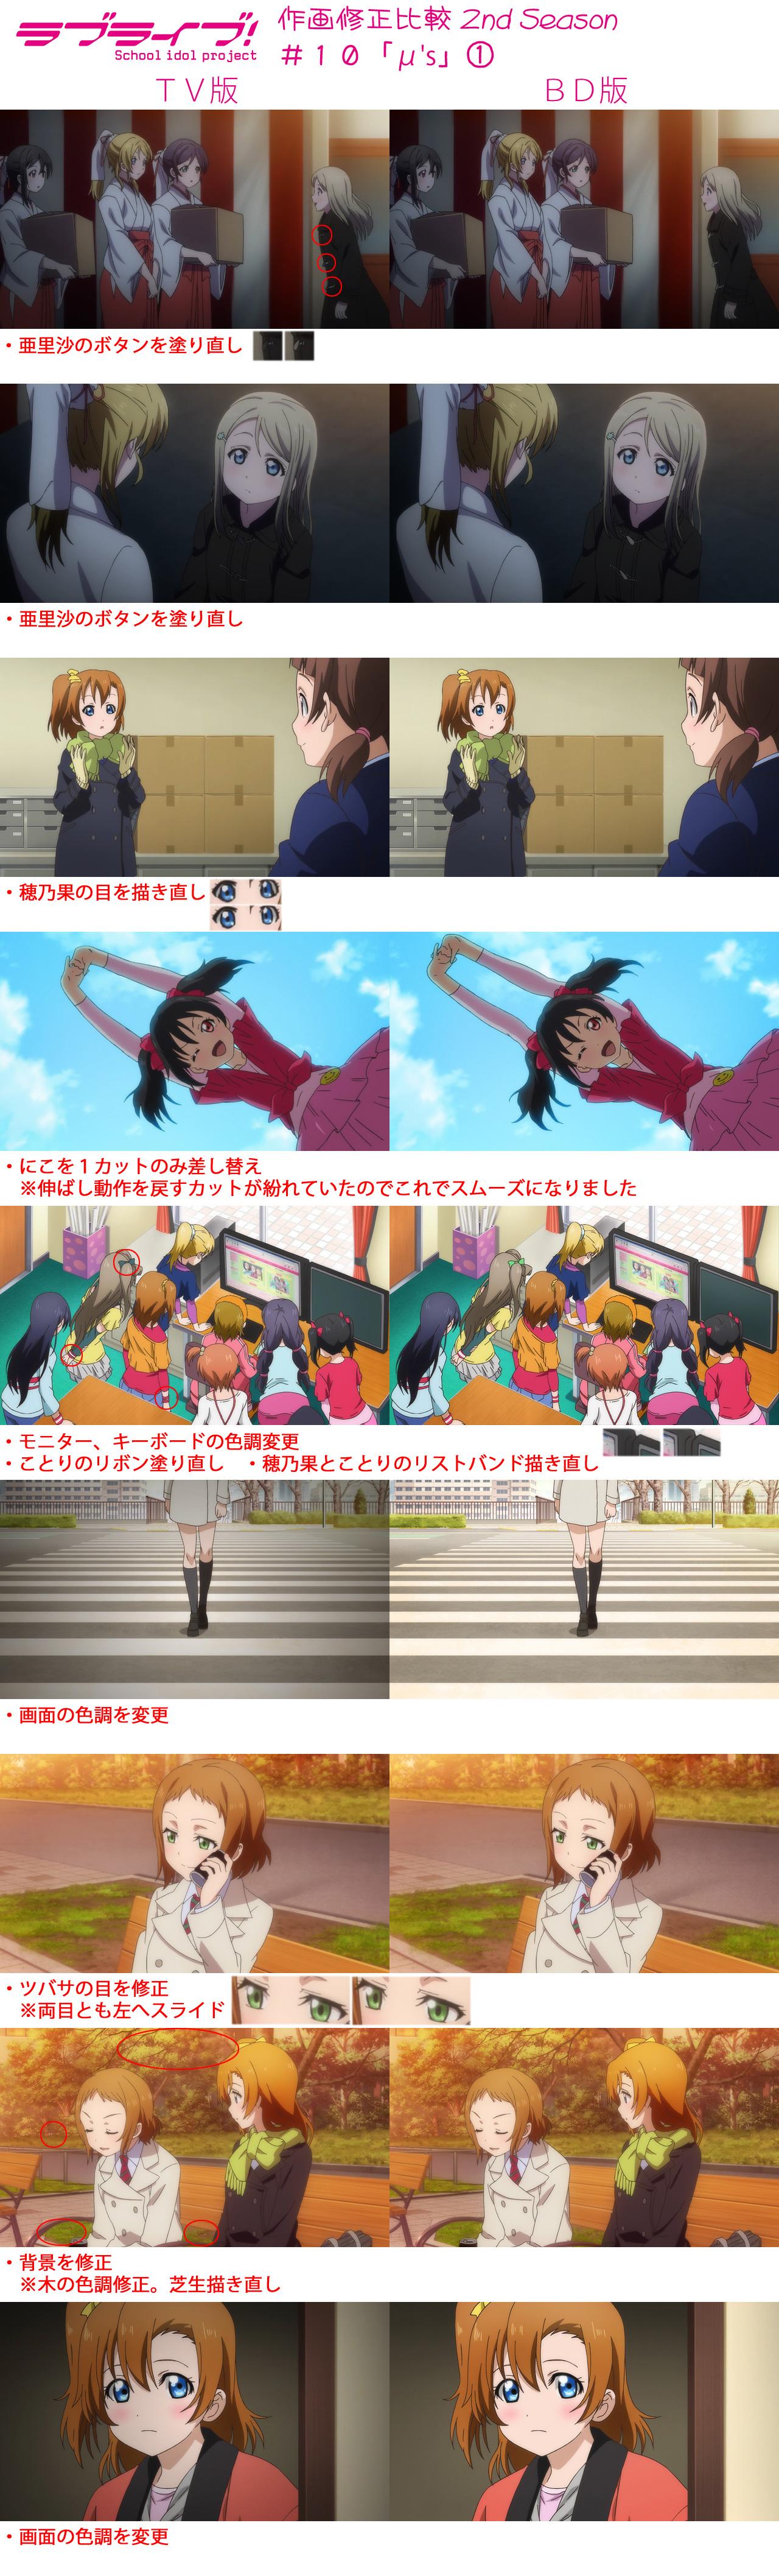 Love-Live!-School-Idol-Project_Haruhichan.com-Season-2-TV-Blu-Ray-Comparison-Episode-10-Part-1